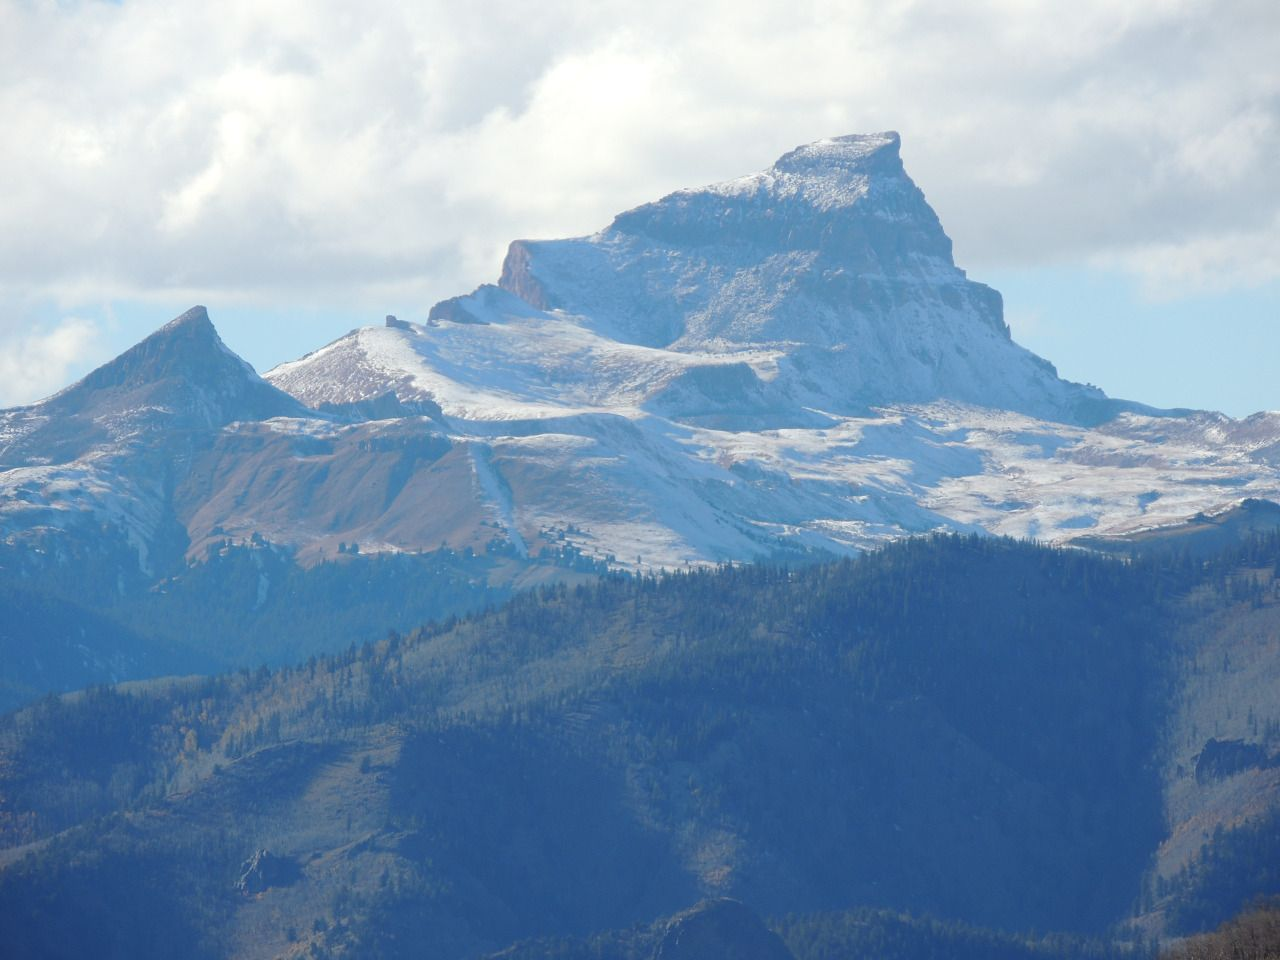 Your Next Destination: Uncompahgre Peak, Colorado, after first snow [OC]...